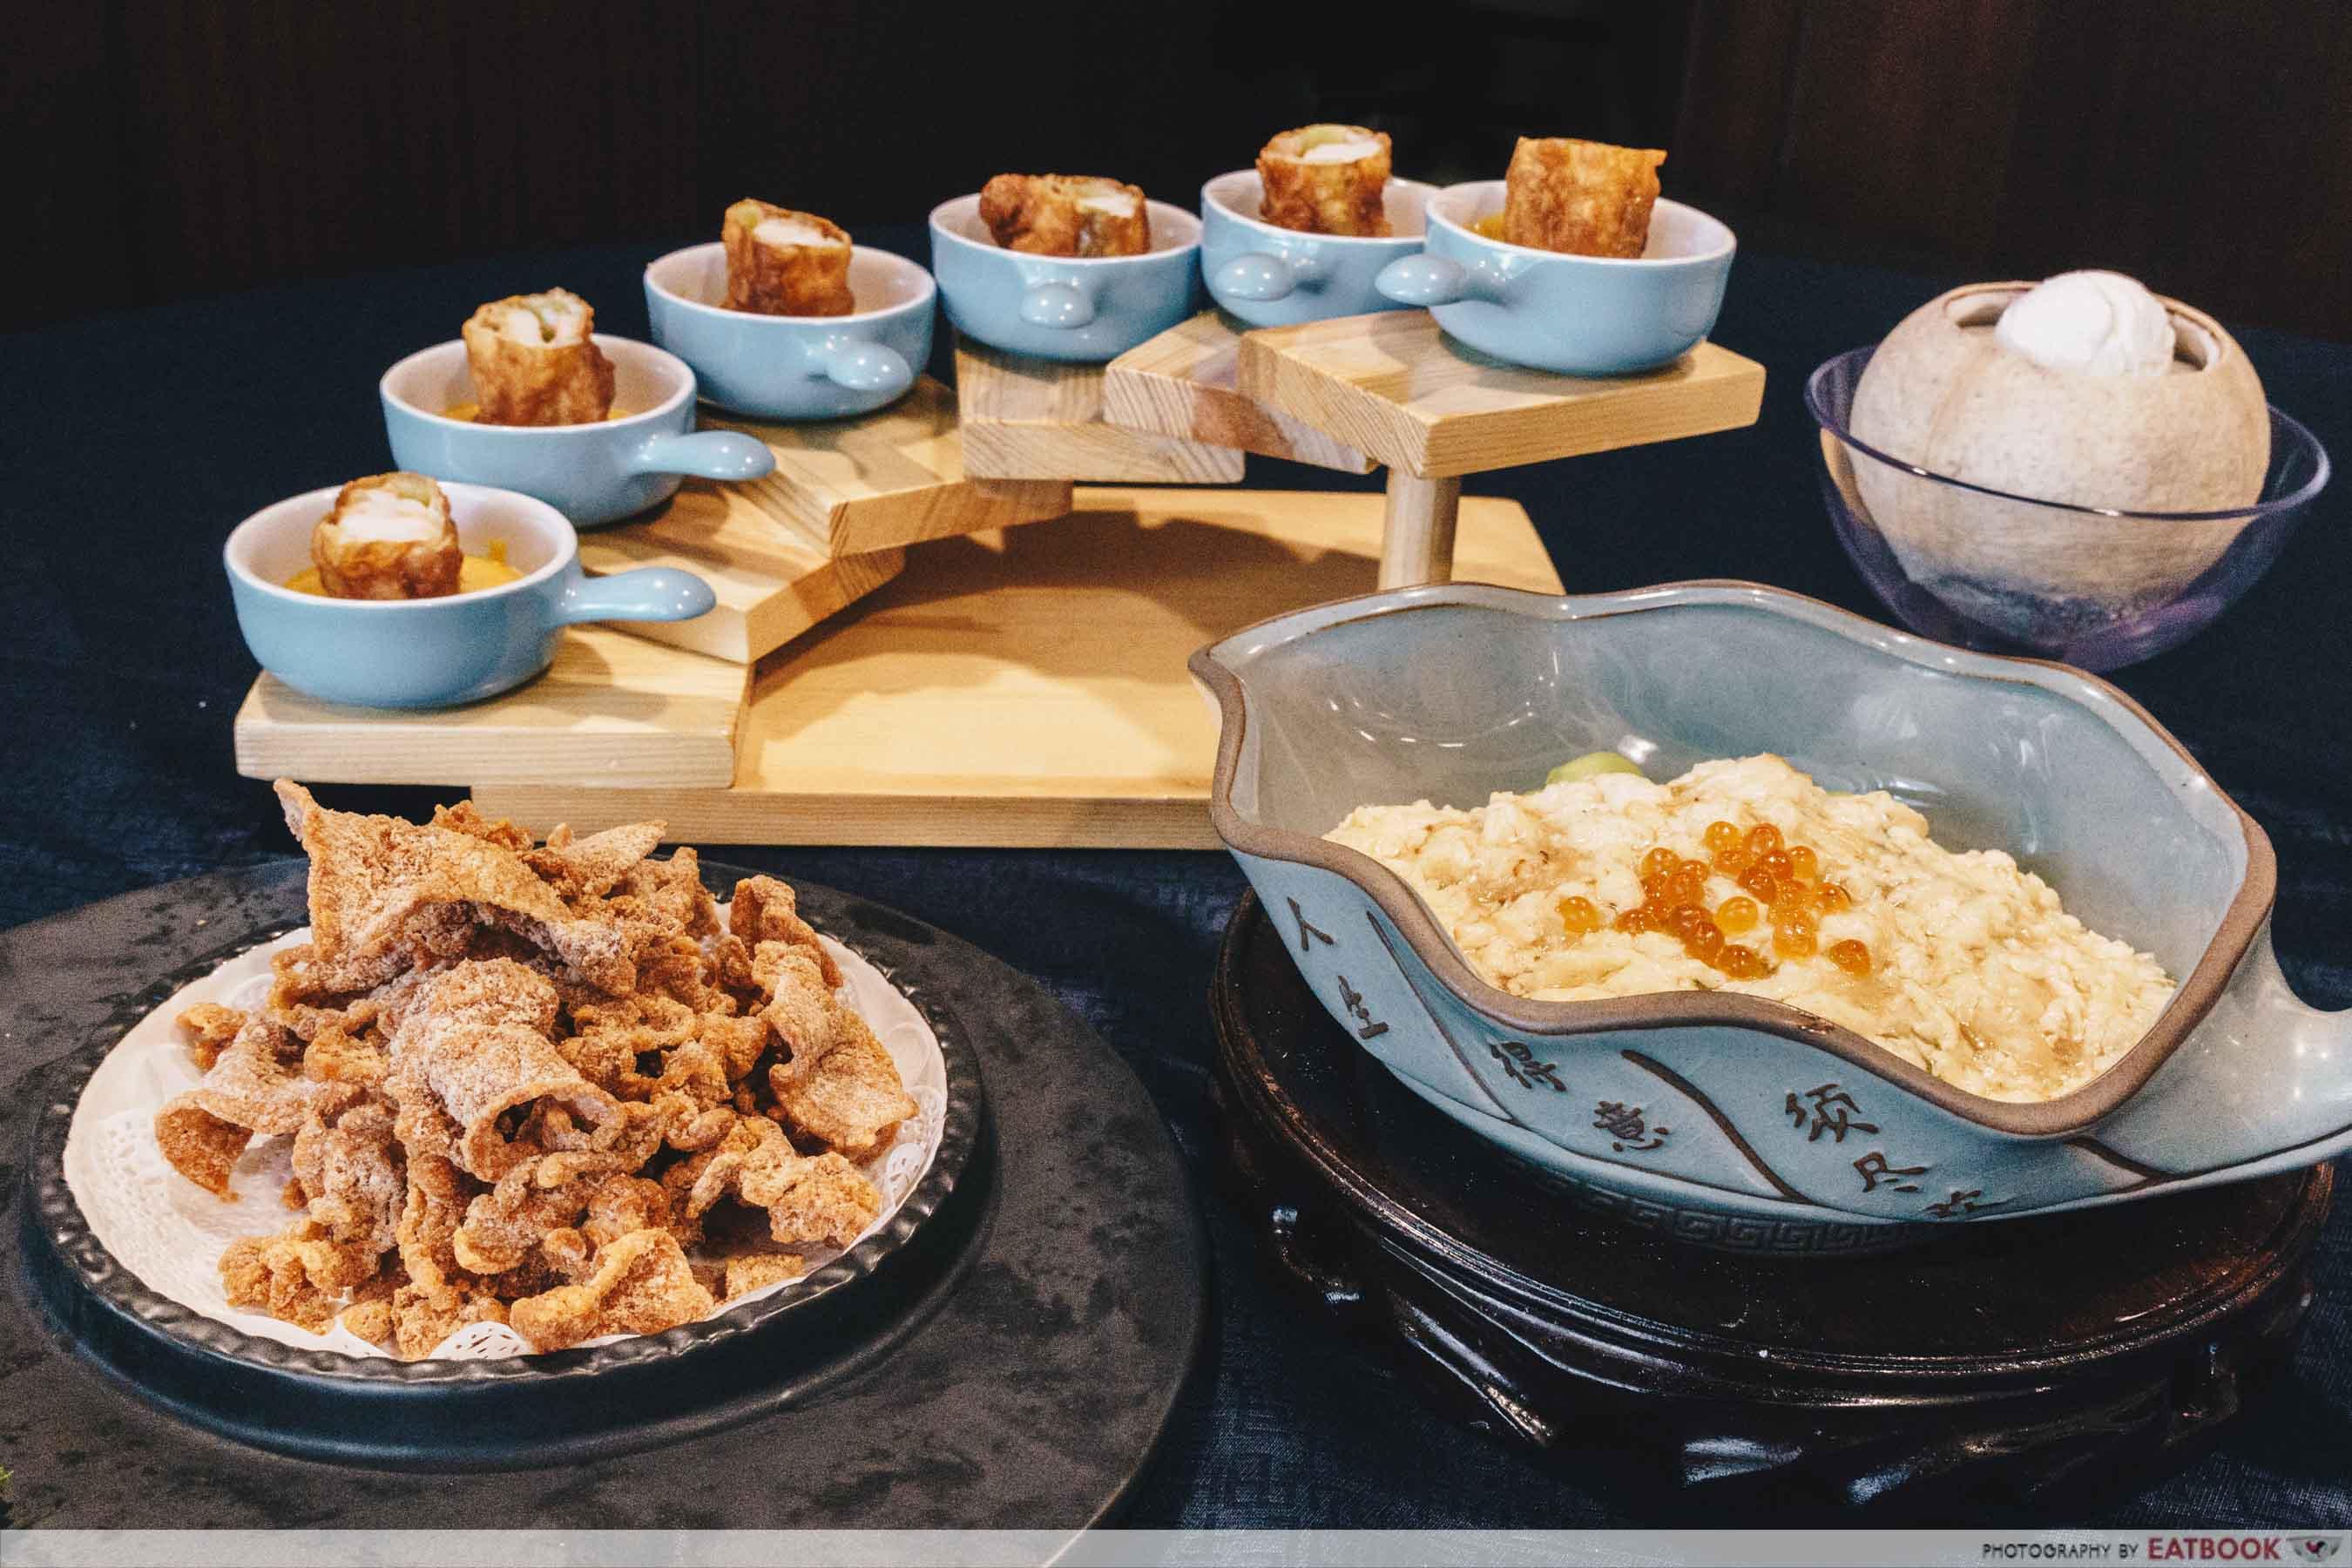 maybank michelin chinese restaurants chef kang's flatlay